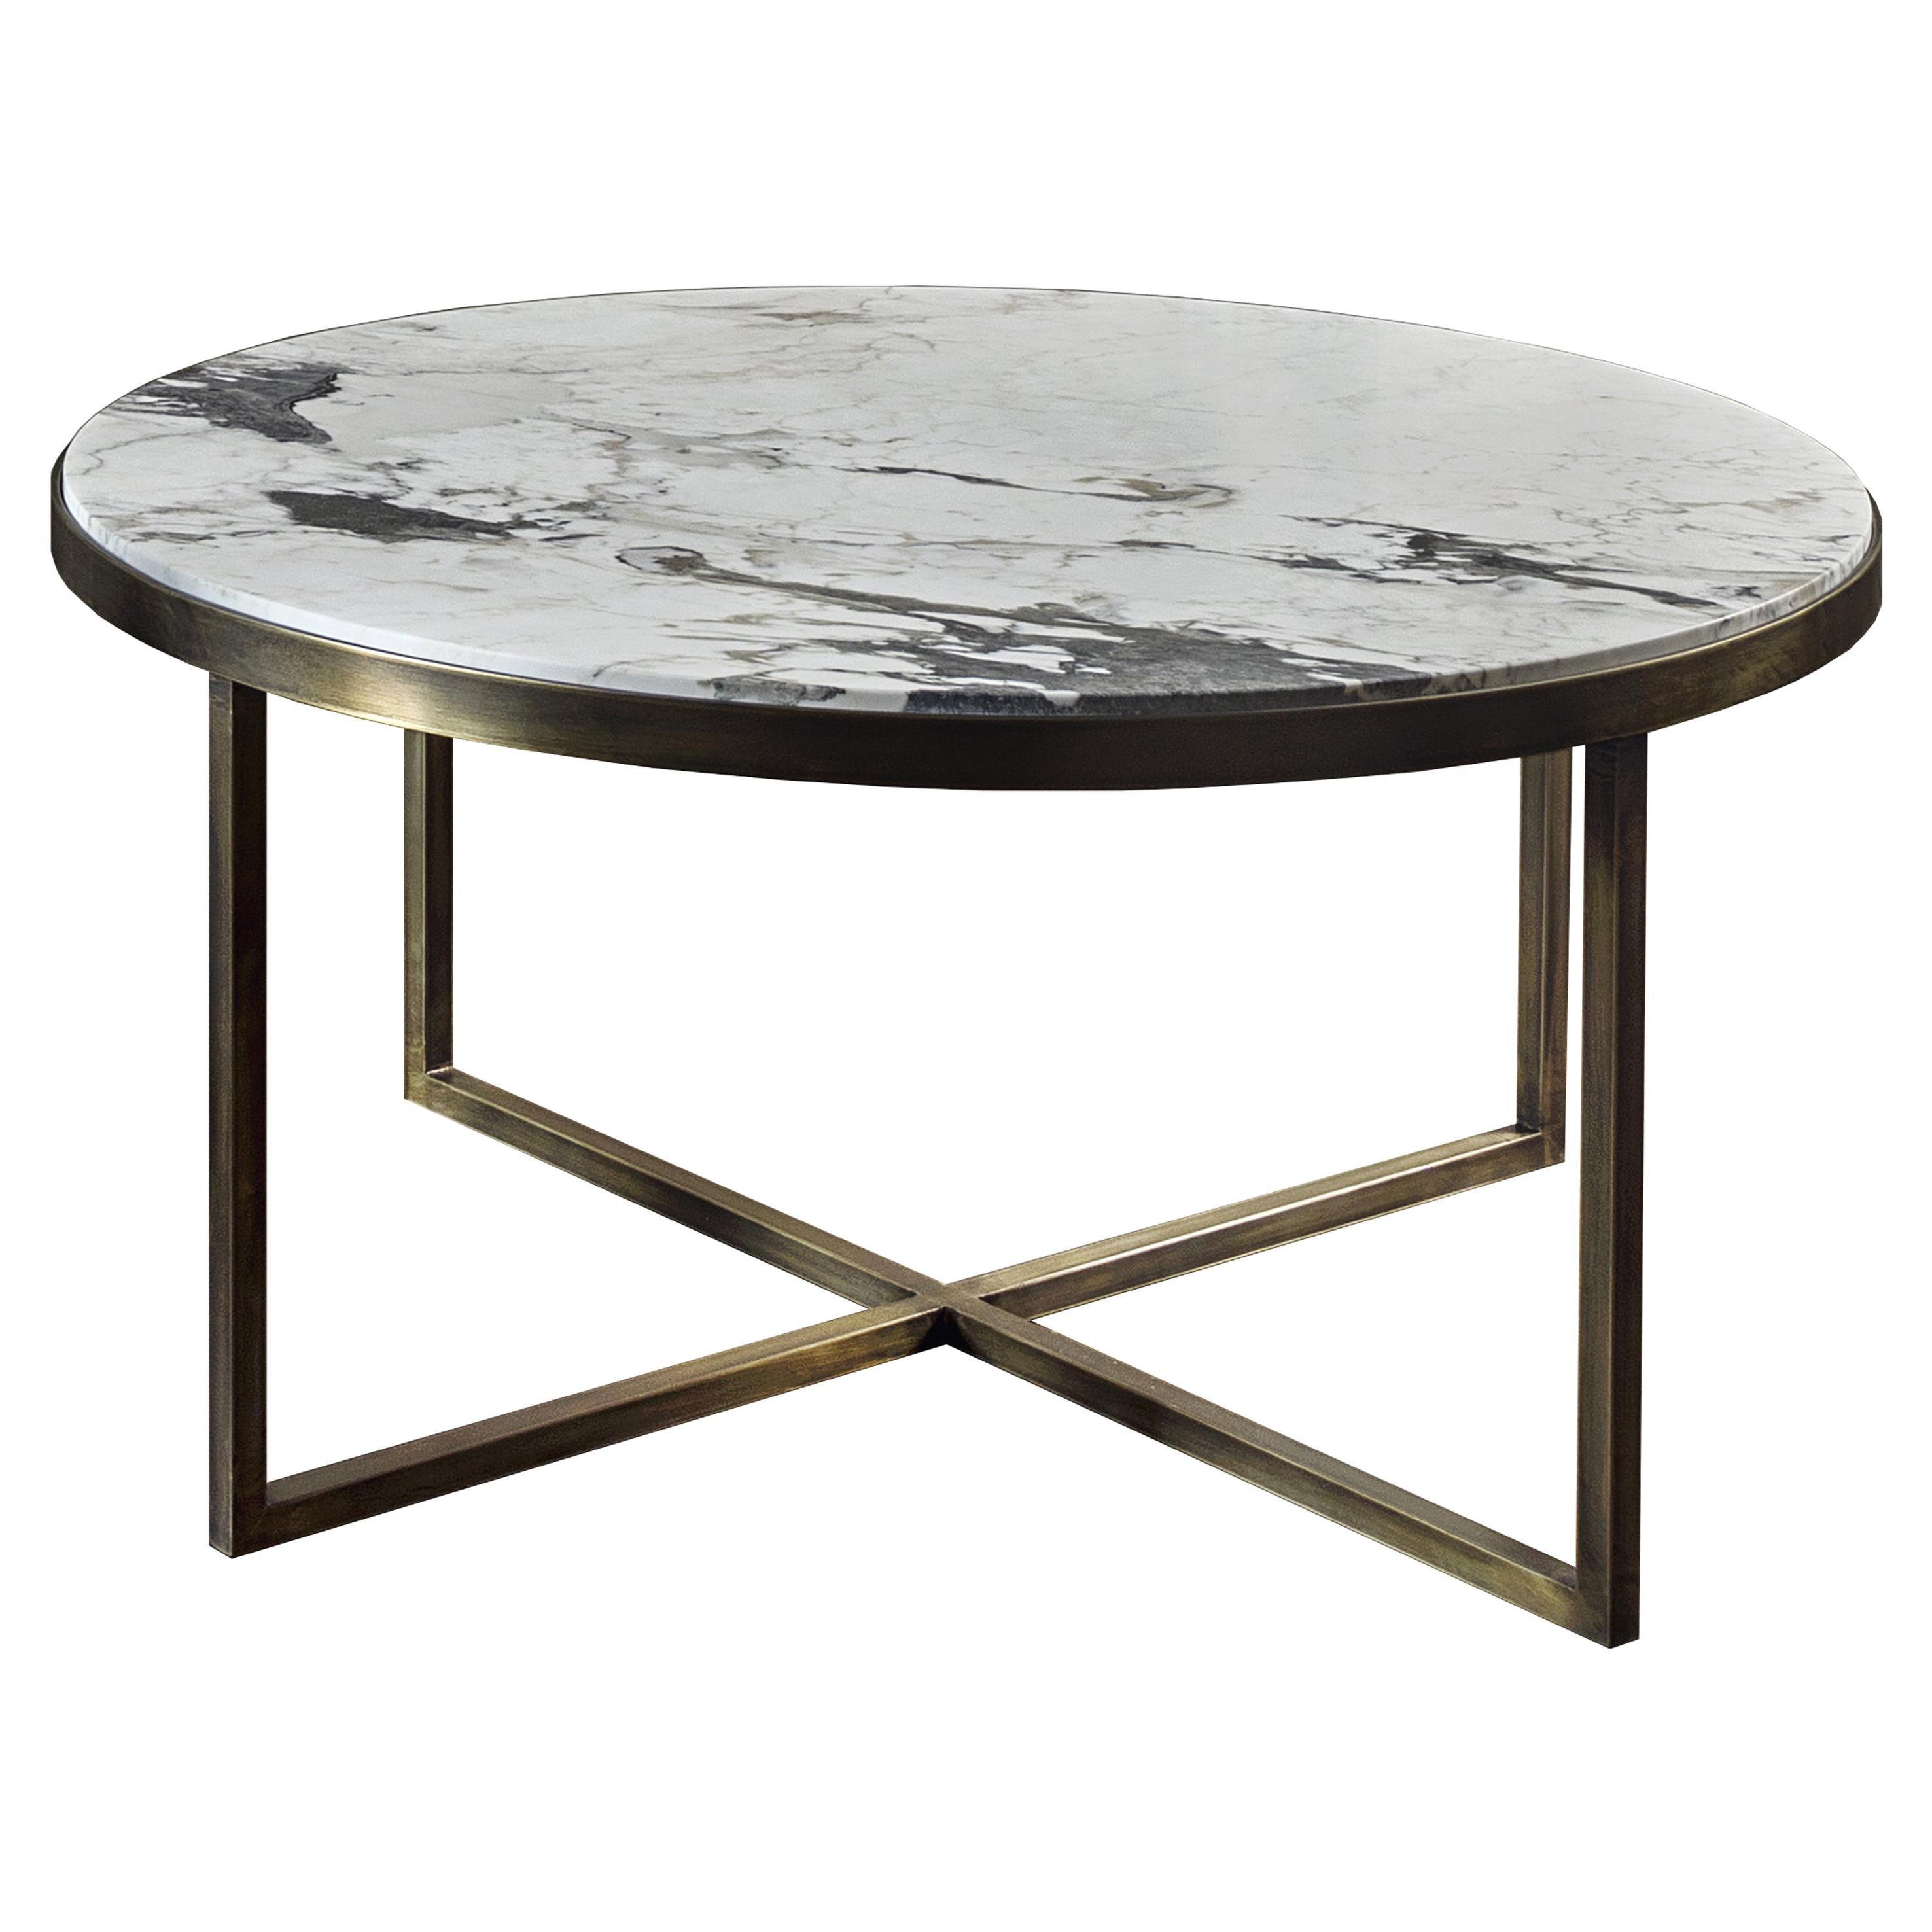 21st Century by Pelizzari Studio Calacatta Coffee Table Natural Brass Legs